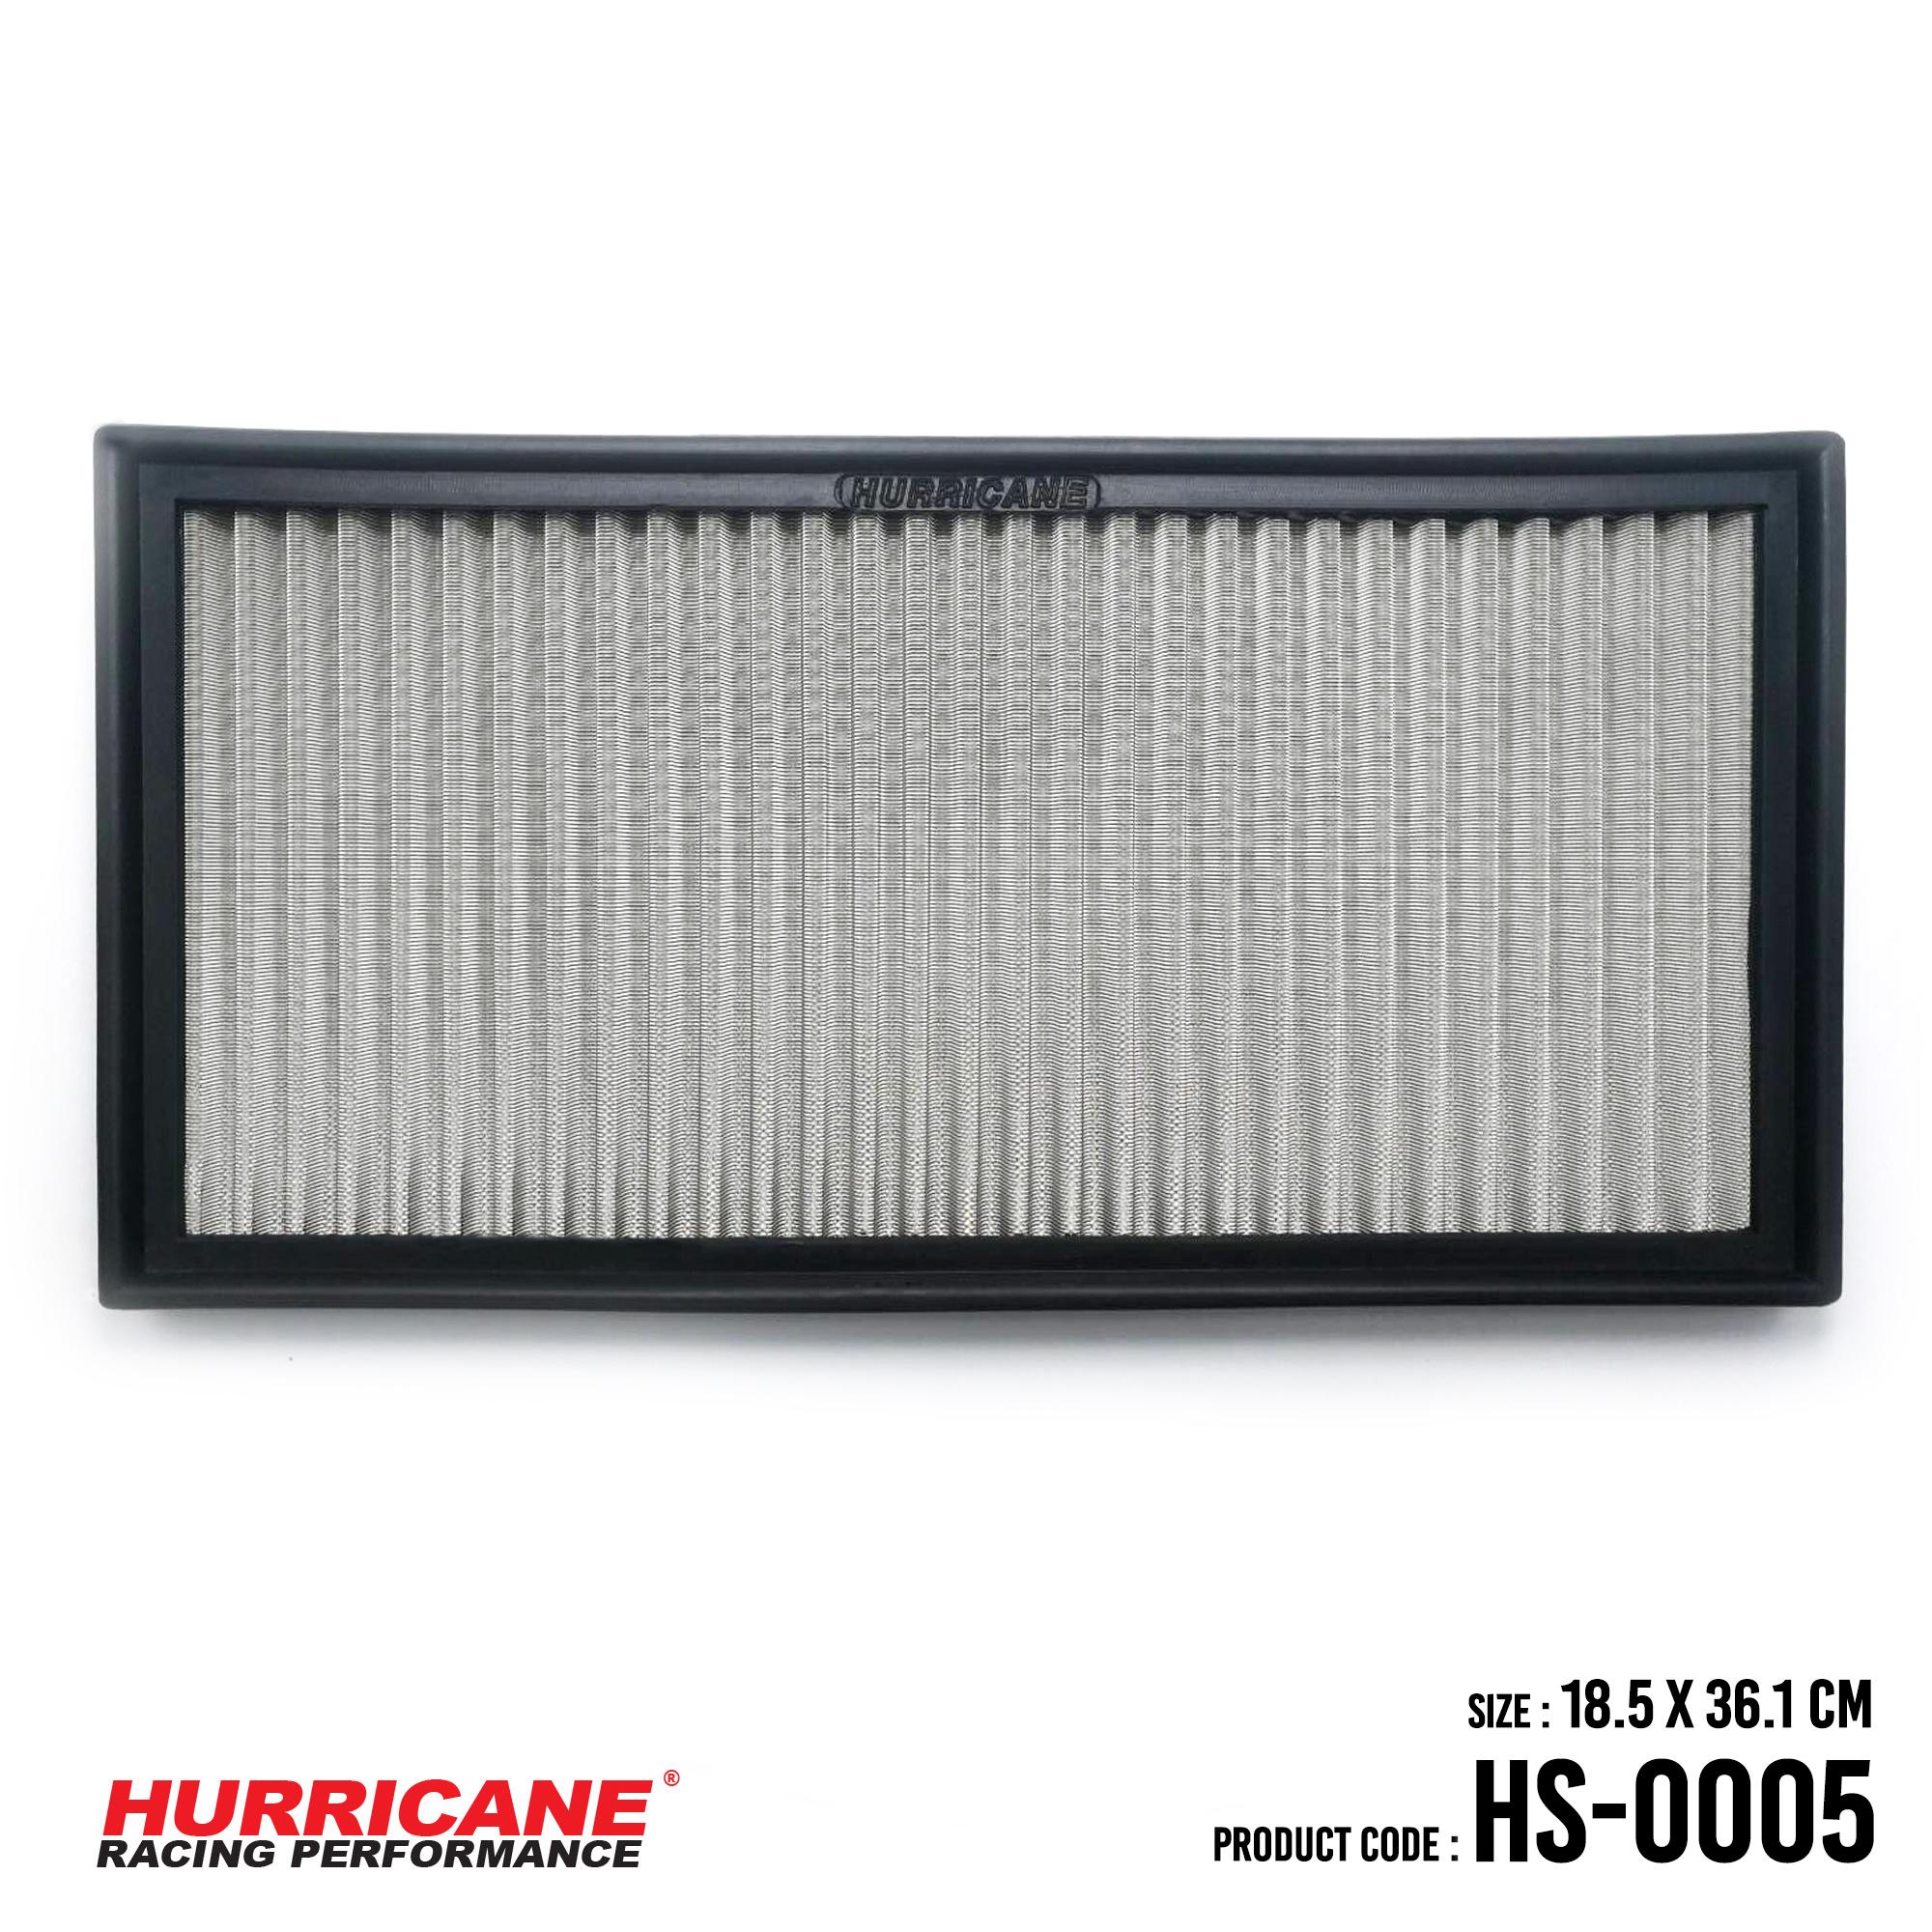 HURRICANE STAINLESS STEEL AIR FILTER FOR HS-0005 AudiMercedesBenzSeatSkodaVolkswagen